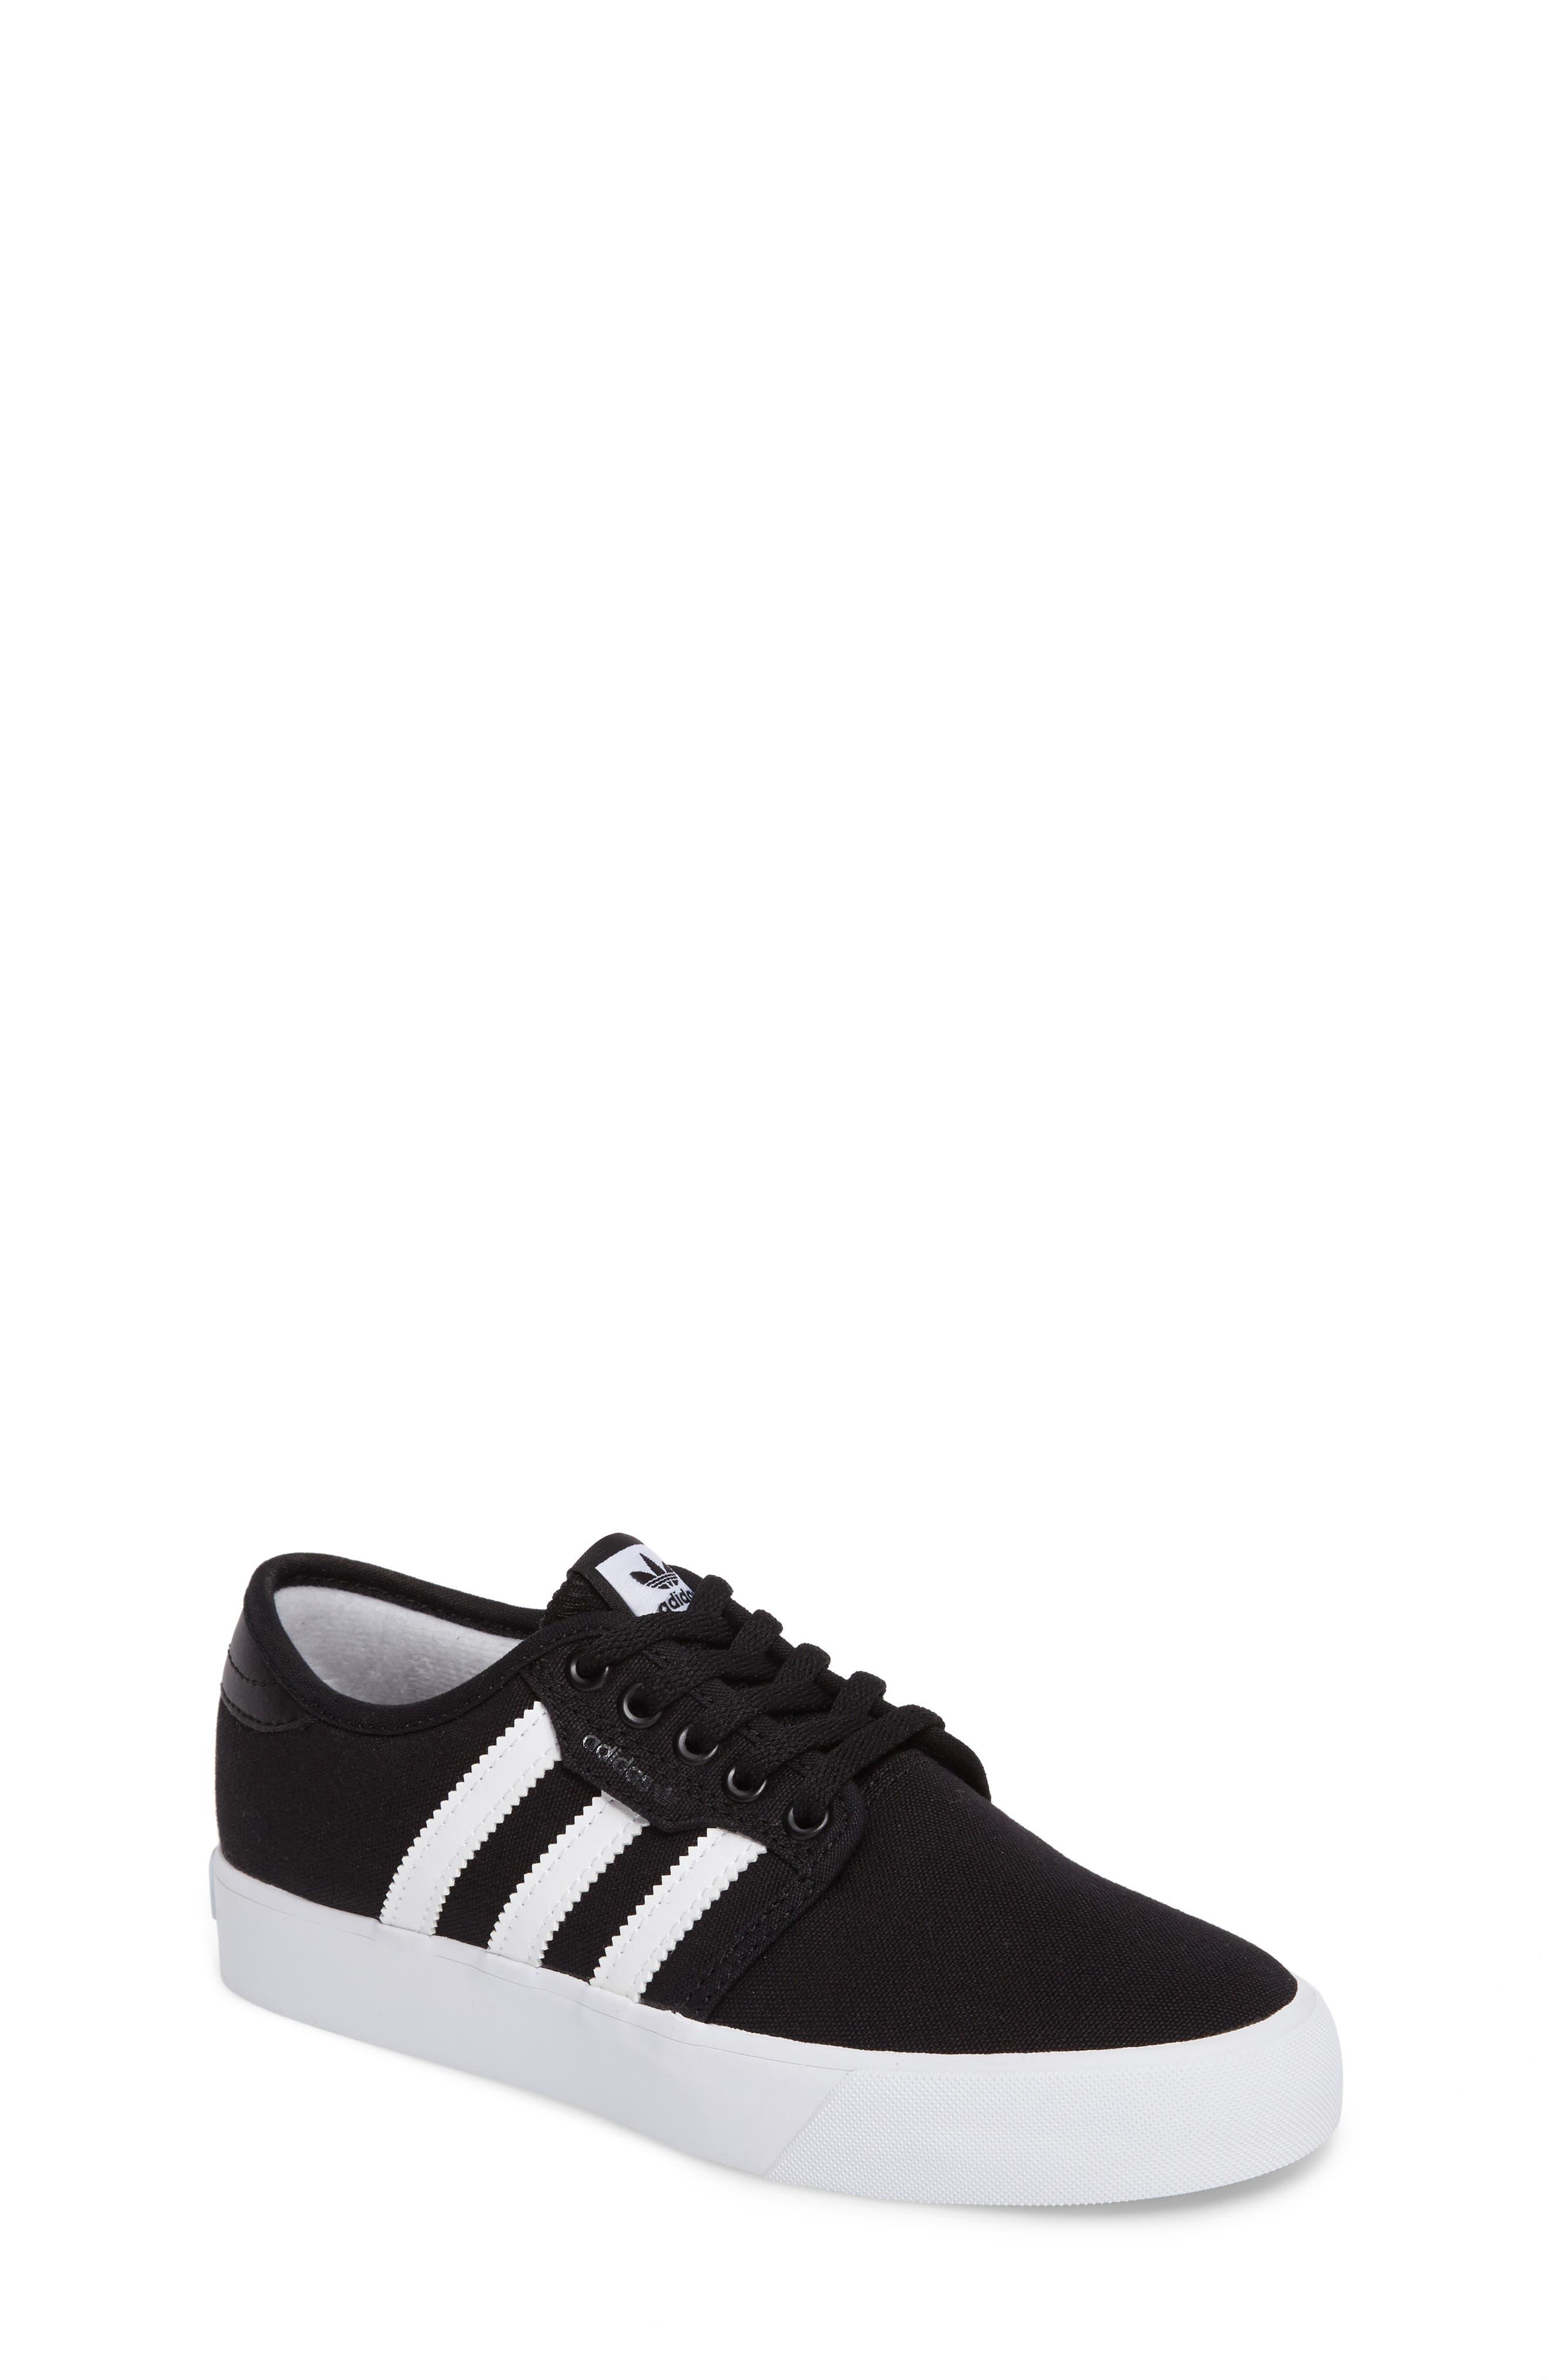 Seeley Sneaker,                             Main thumbnail 1, color,                             002